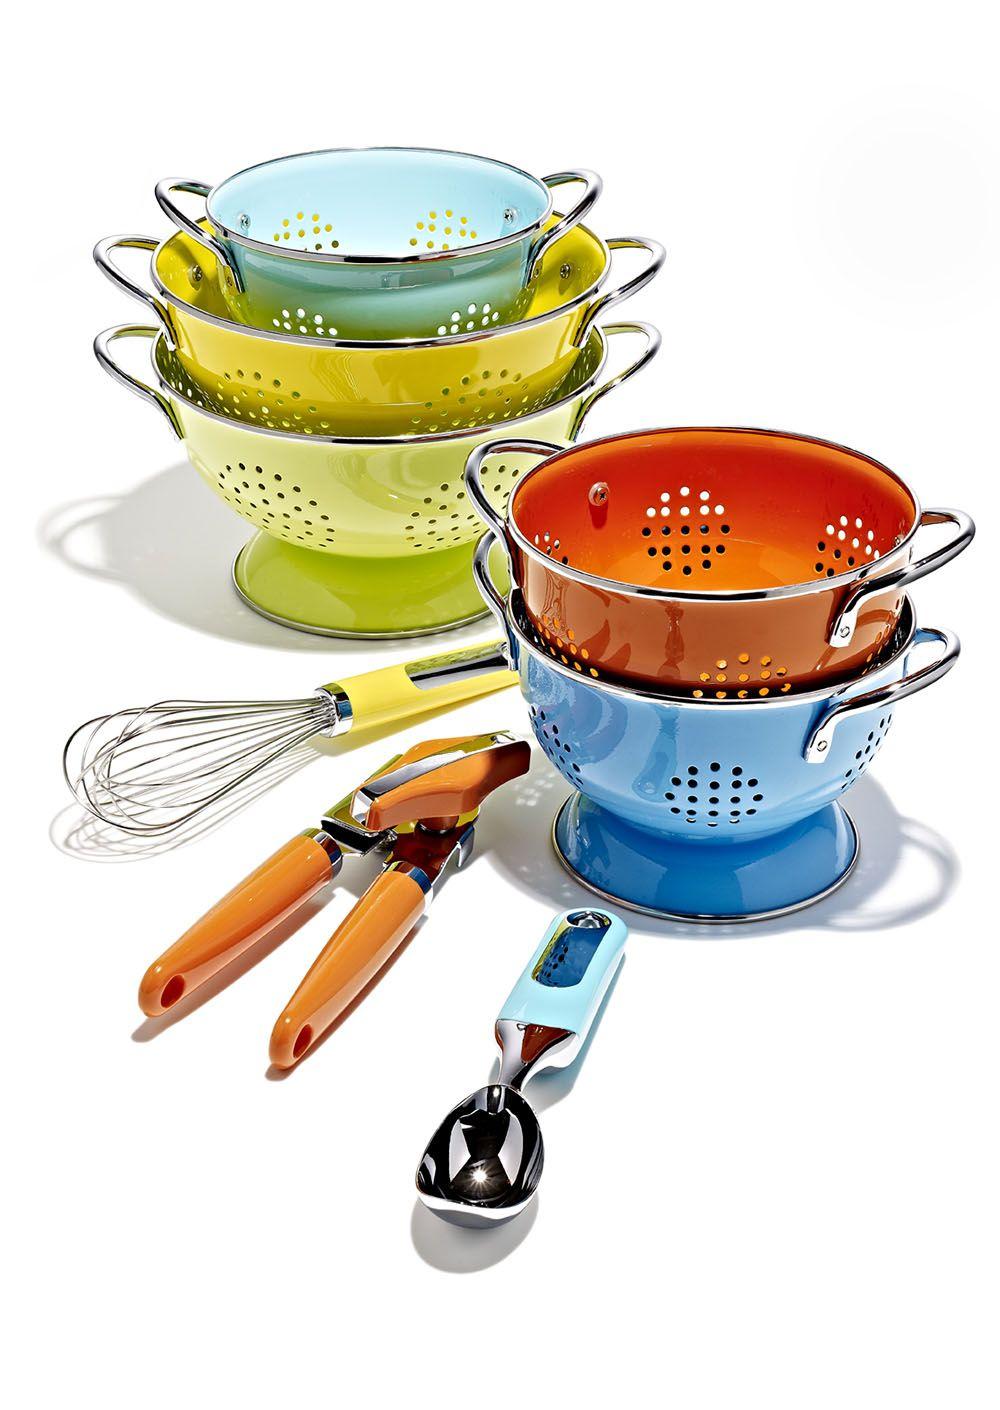 Superbe Bright Kitchen Basics #Marshalls #kitchen #cooking